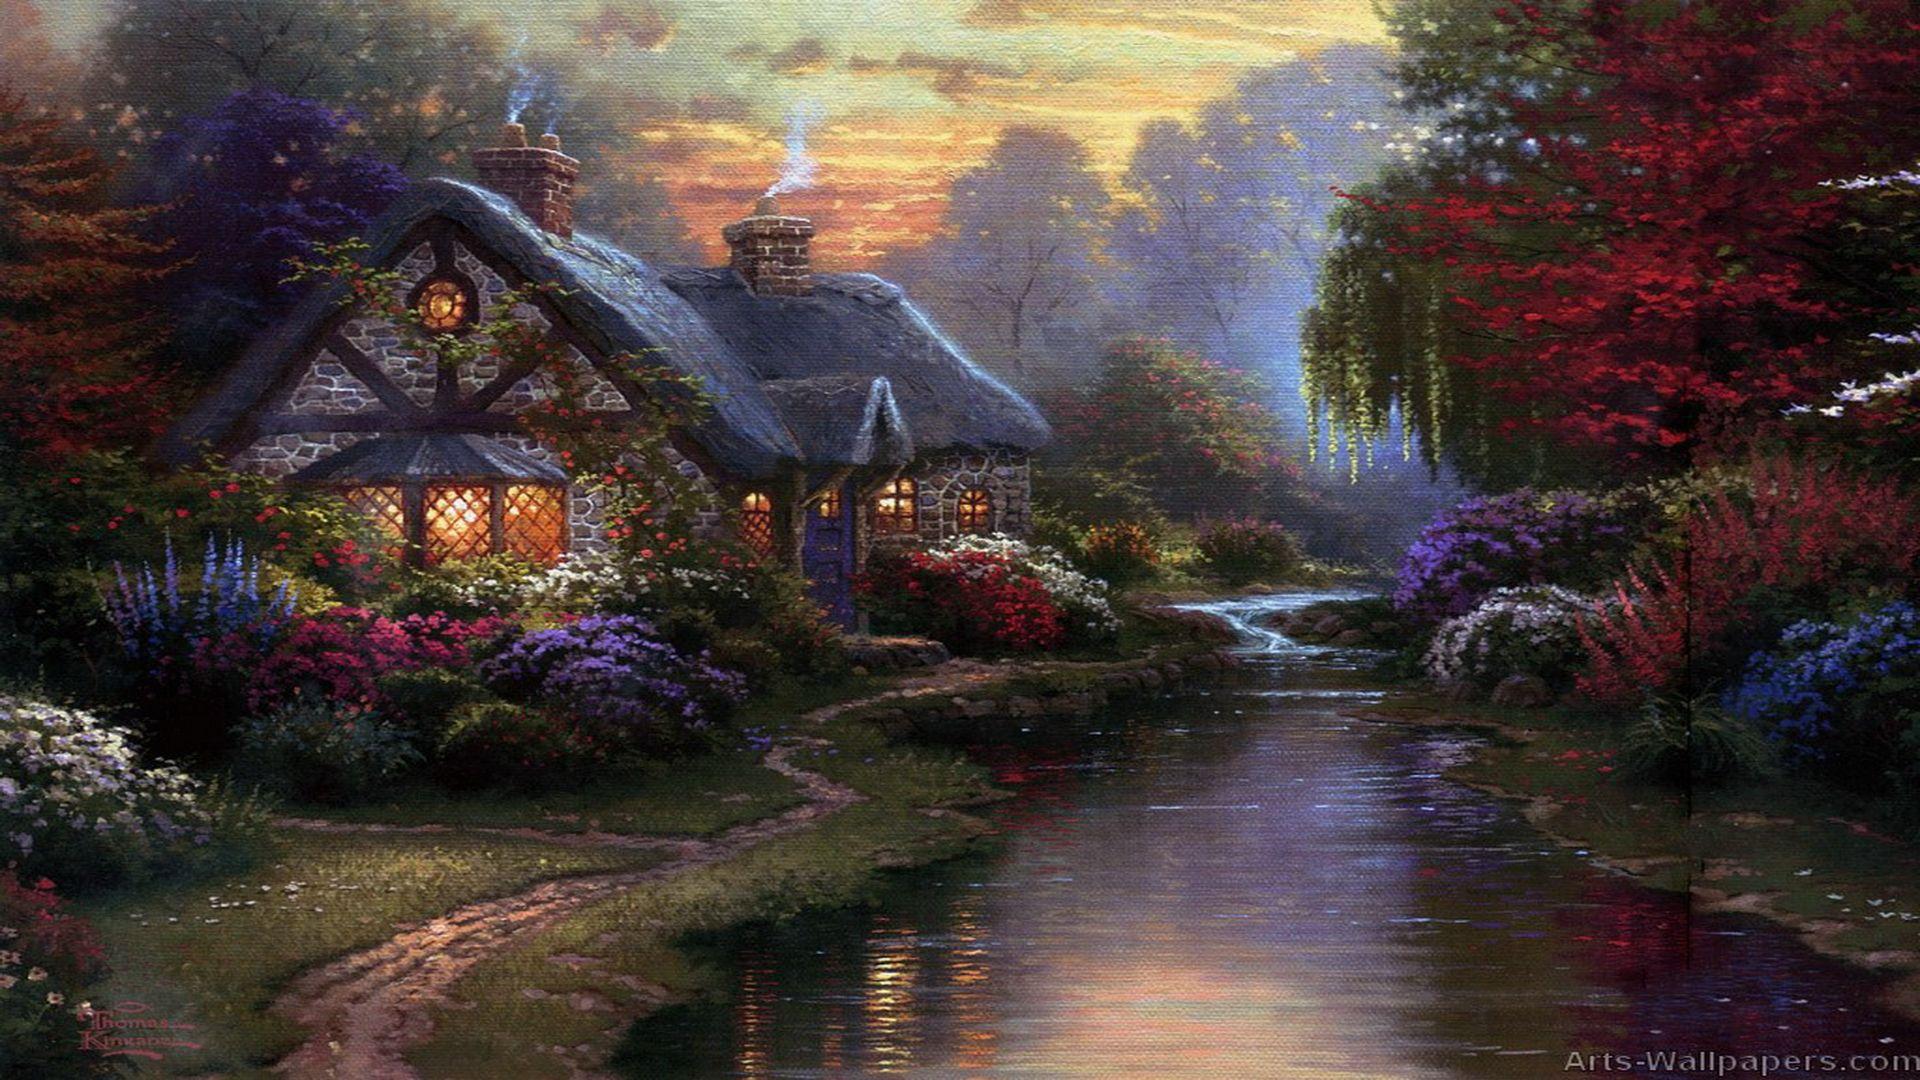 Thomas Kinkade Autumn Paintings | Megan Fox Wallpapers ...